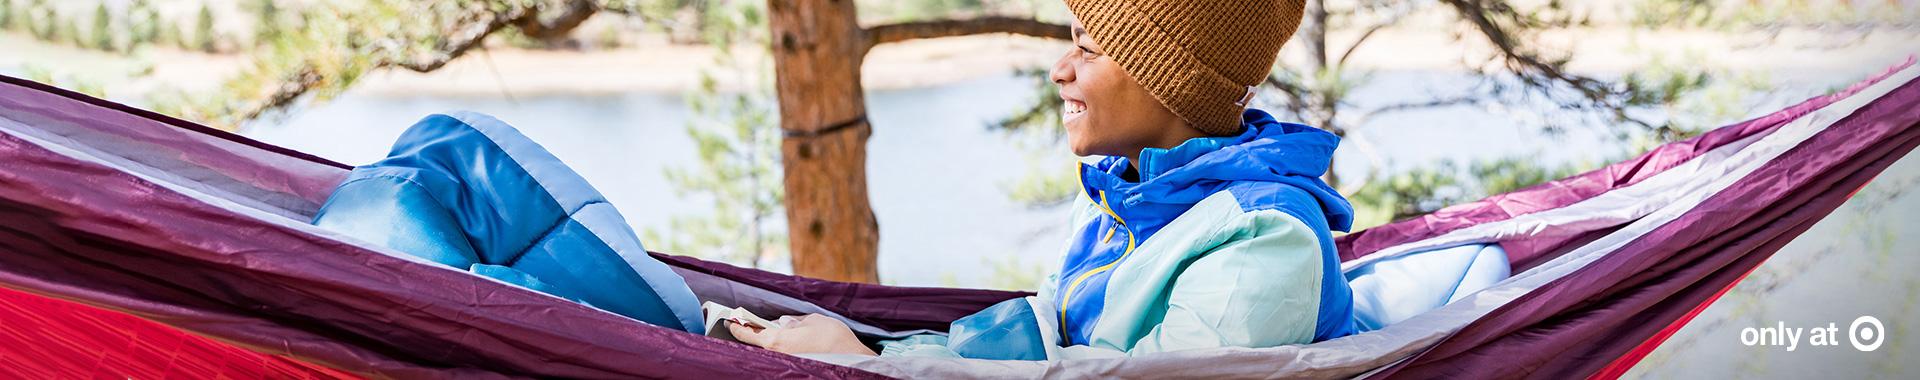 Woman sitting in a Sierra Designs hammock